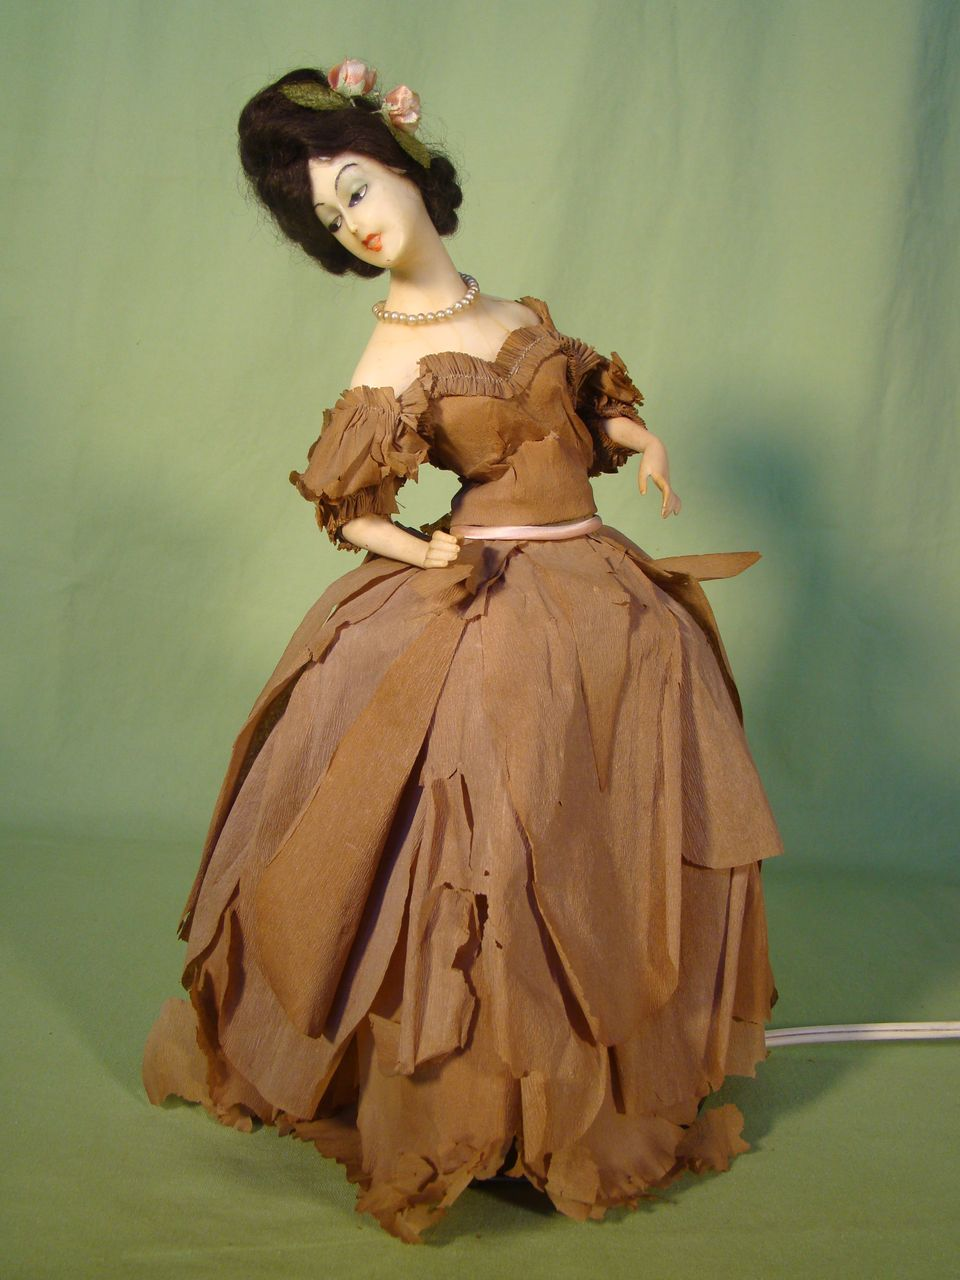 Vintage Wax Boudoir Half Doll Lamp W Original Crepe Paper